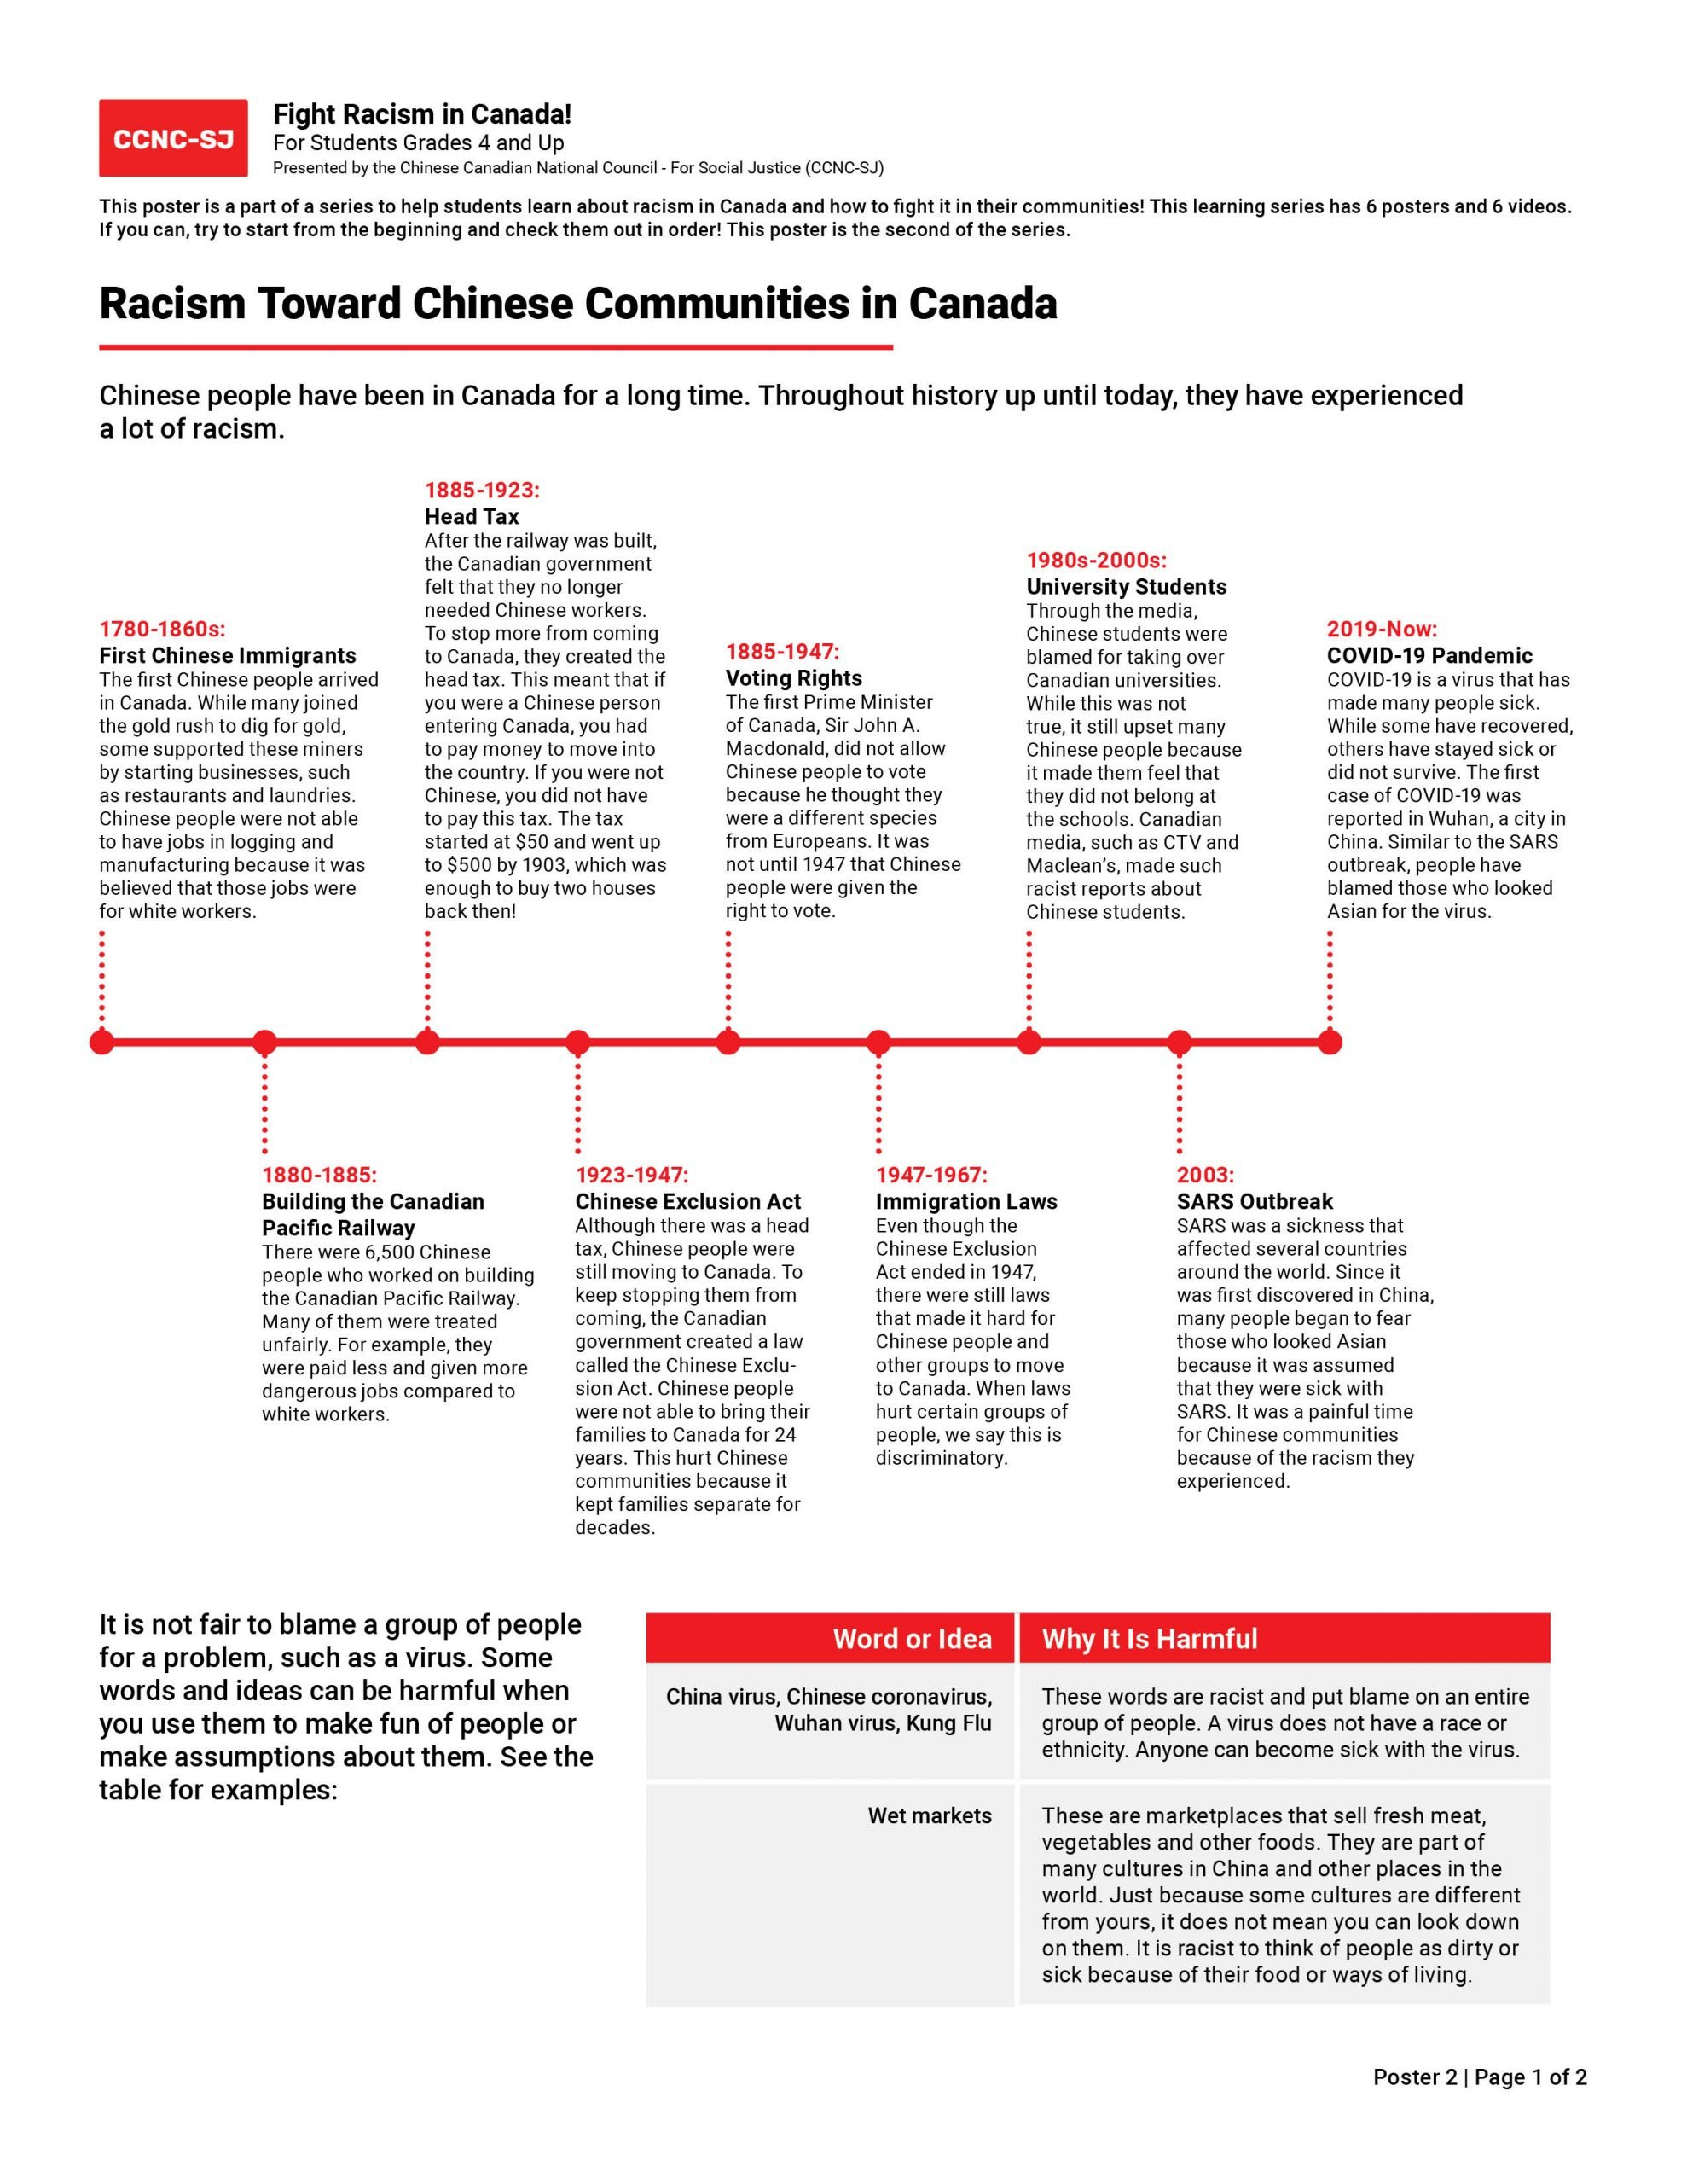 ccncsj_infographics_2-1